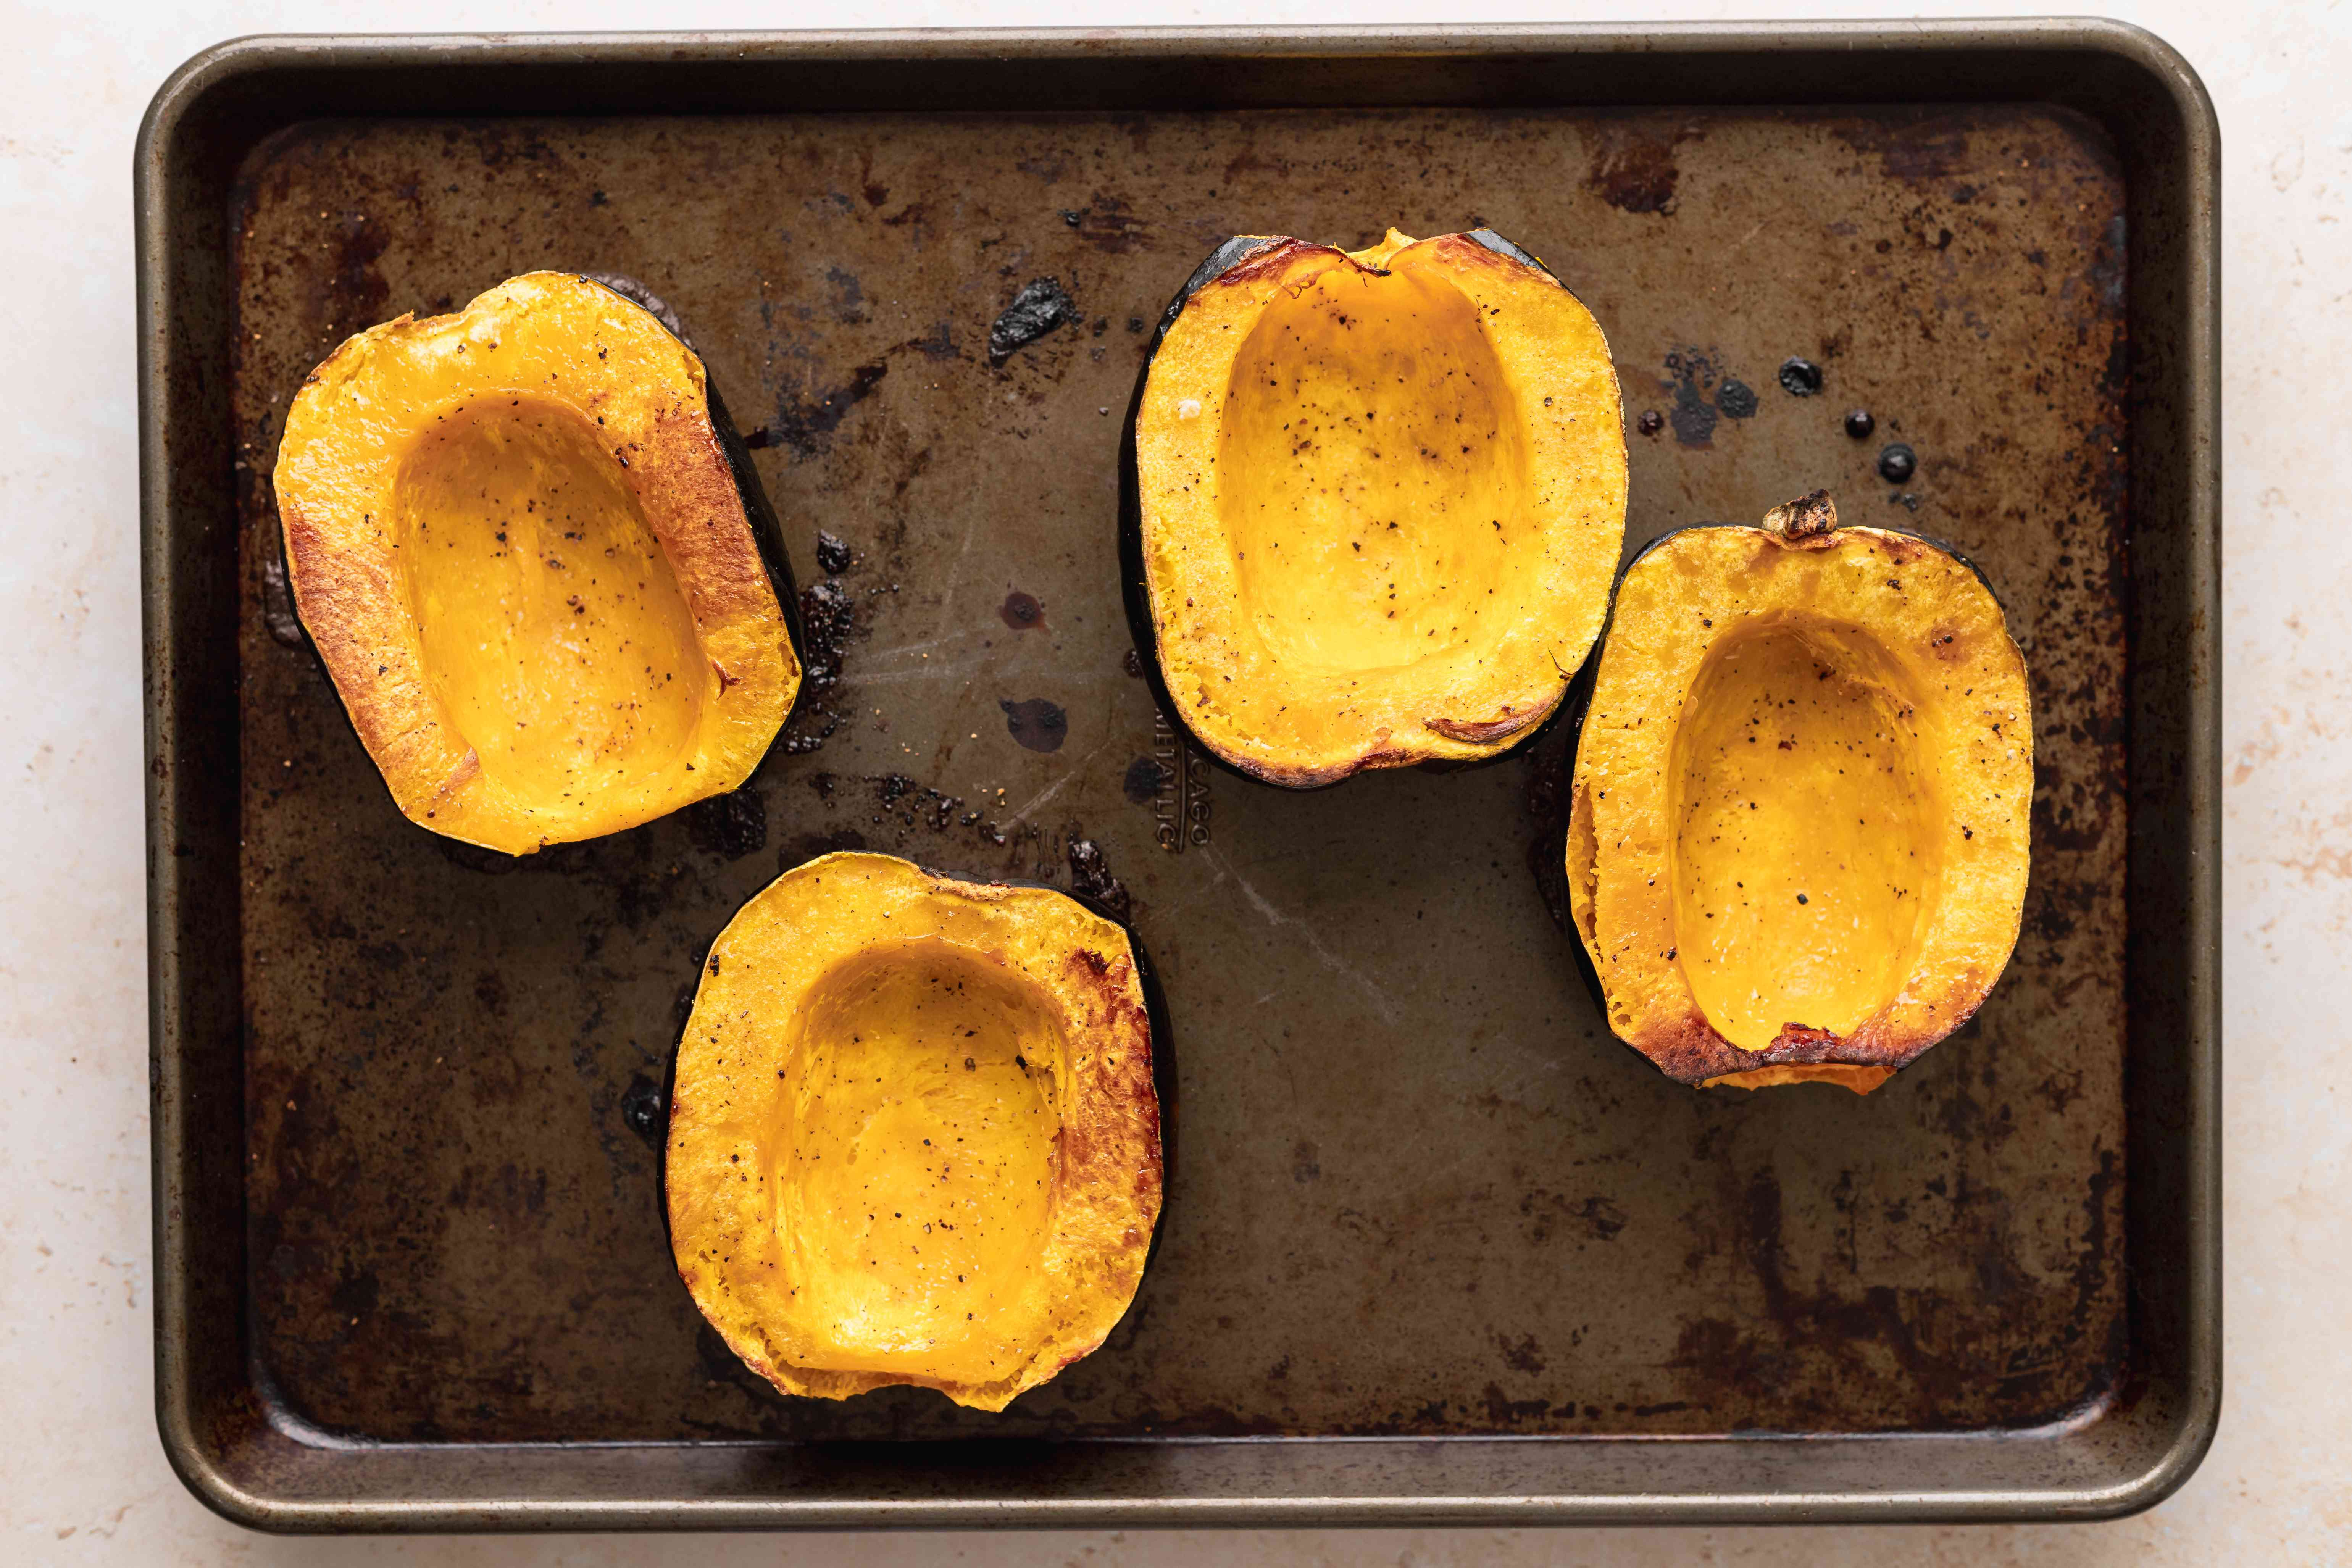 Halved acorn squash roasting on a baking sheet to make vegetarian stuffed squash.